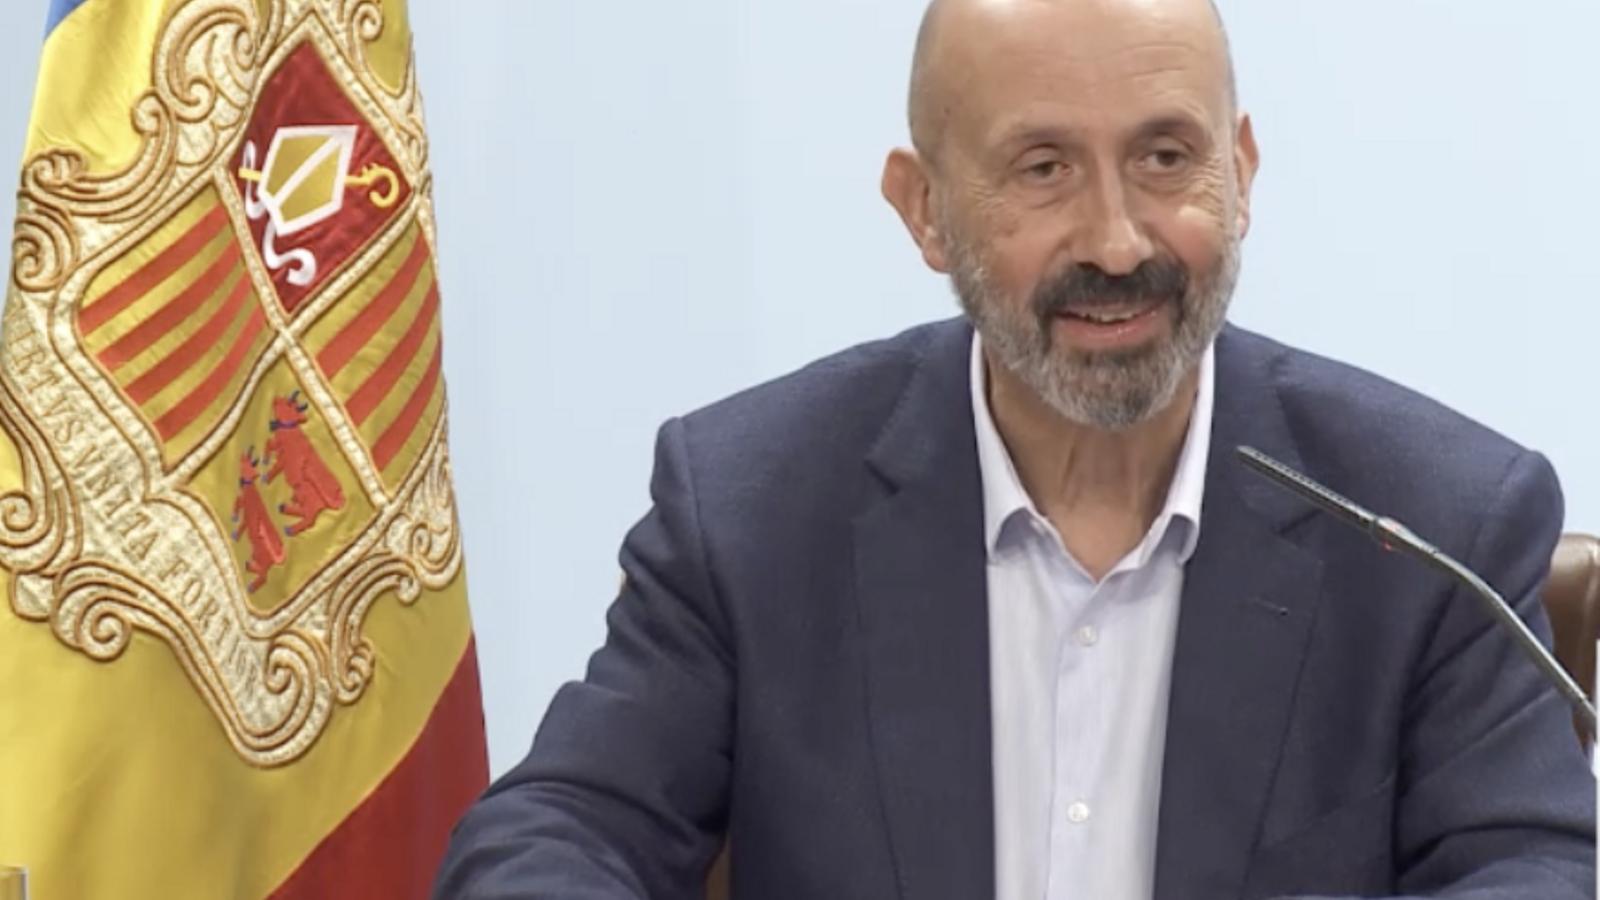 El ministre de Salut, Joan Martínez Benazet. / ANA